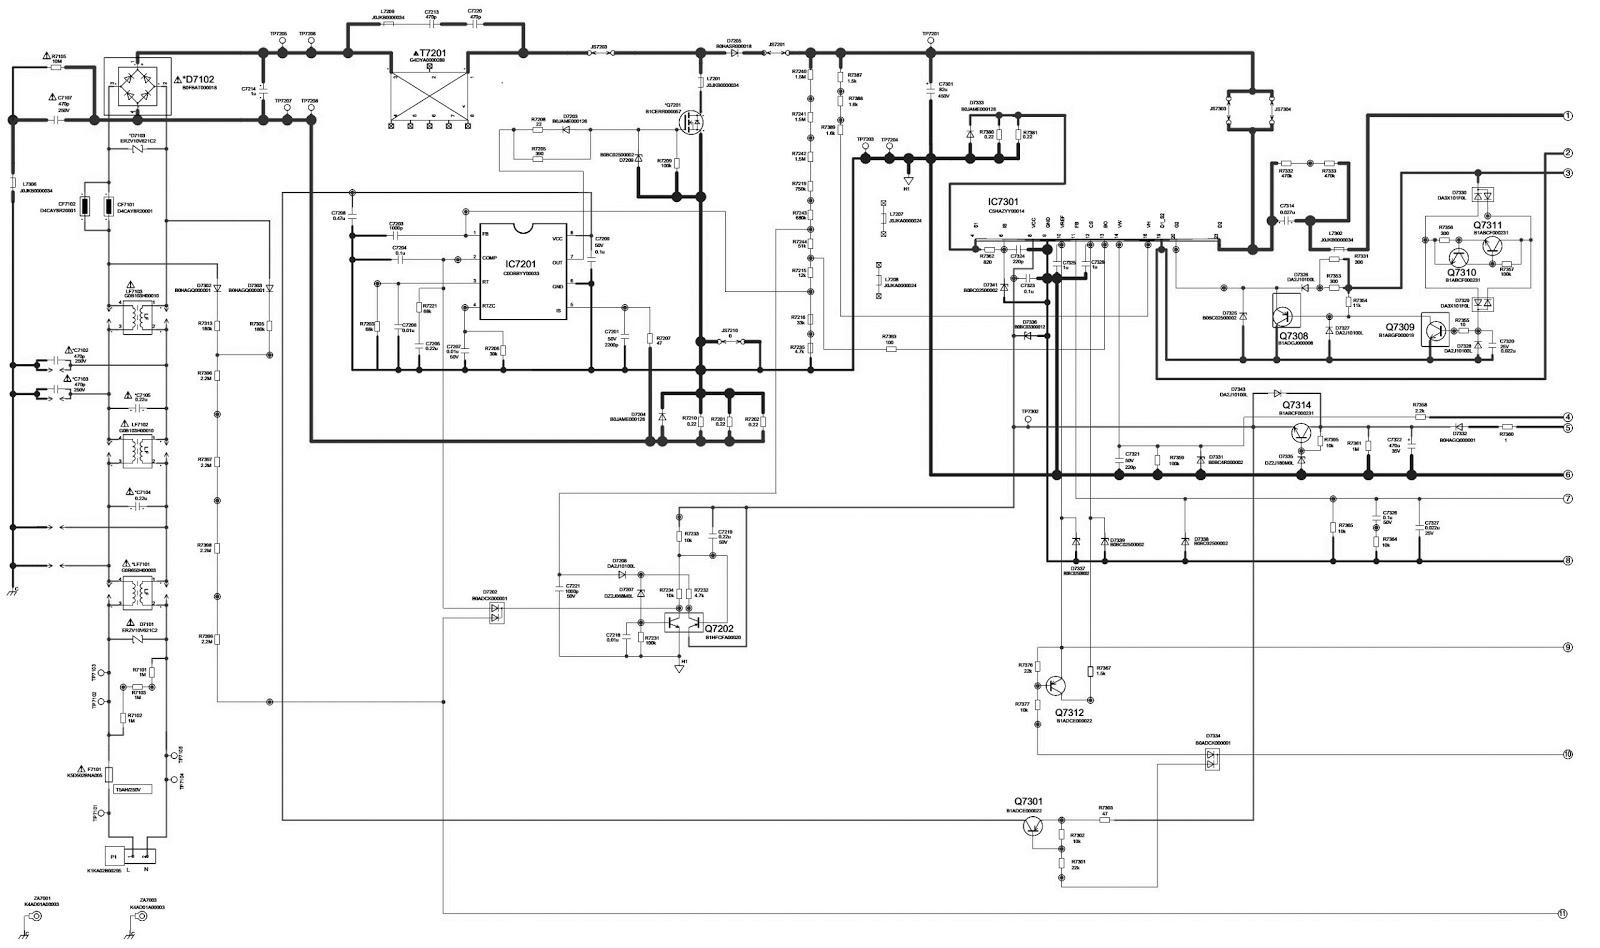 tnpa5364bj smps schematic panasonic th l32x30c lcd. Black Bedroom Furniture Sets. Home Design Ideas